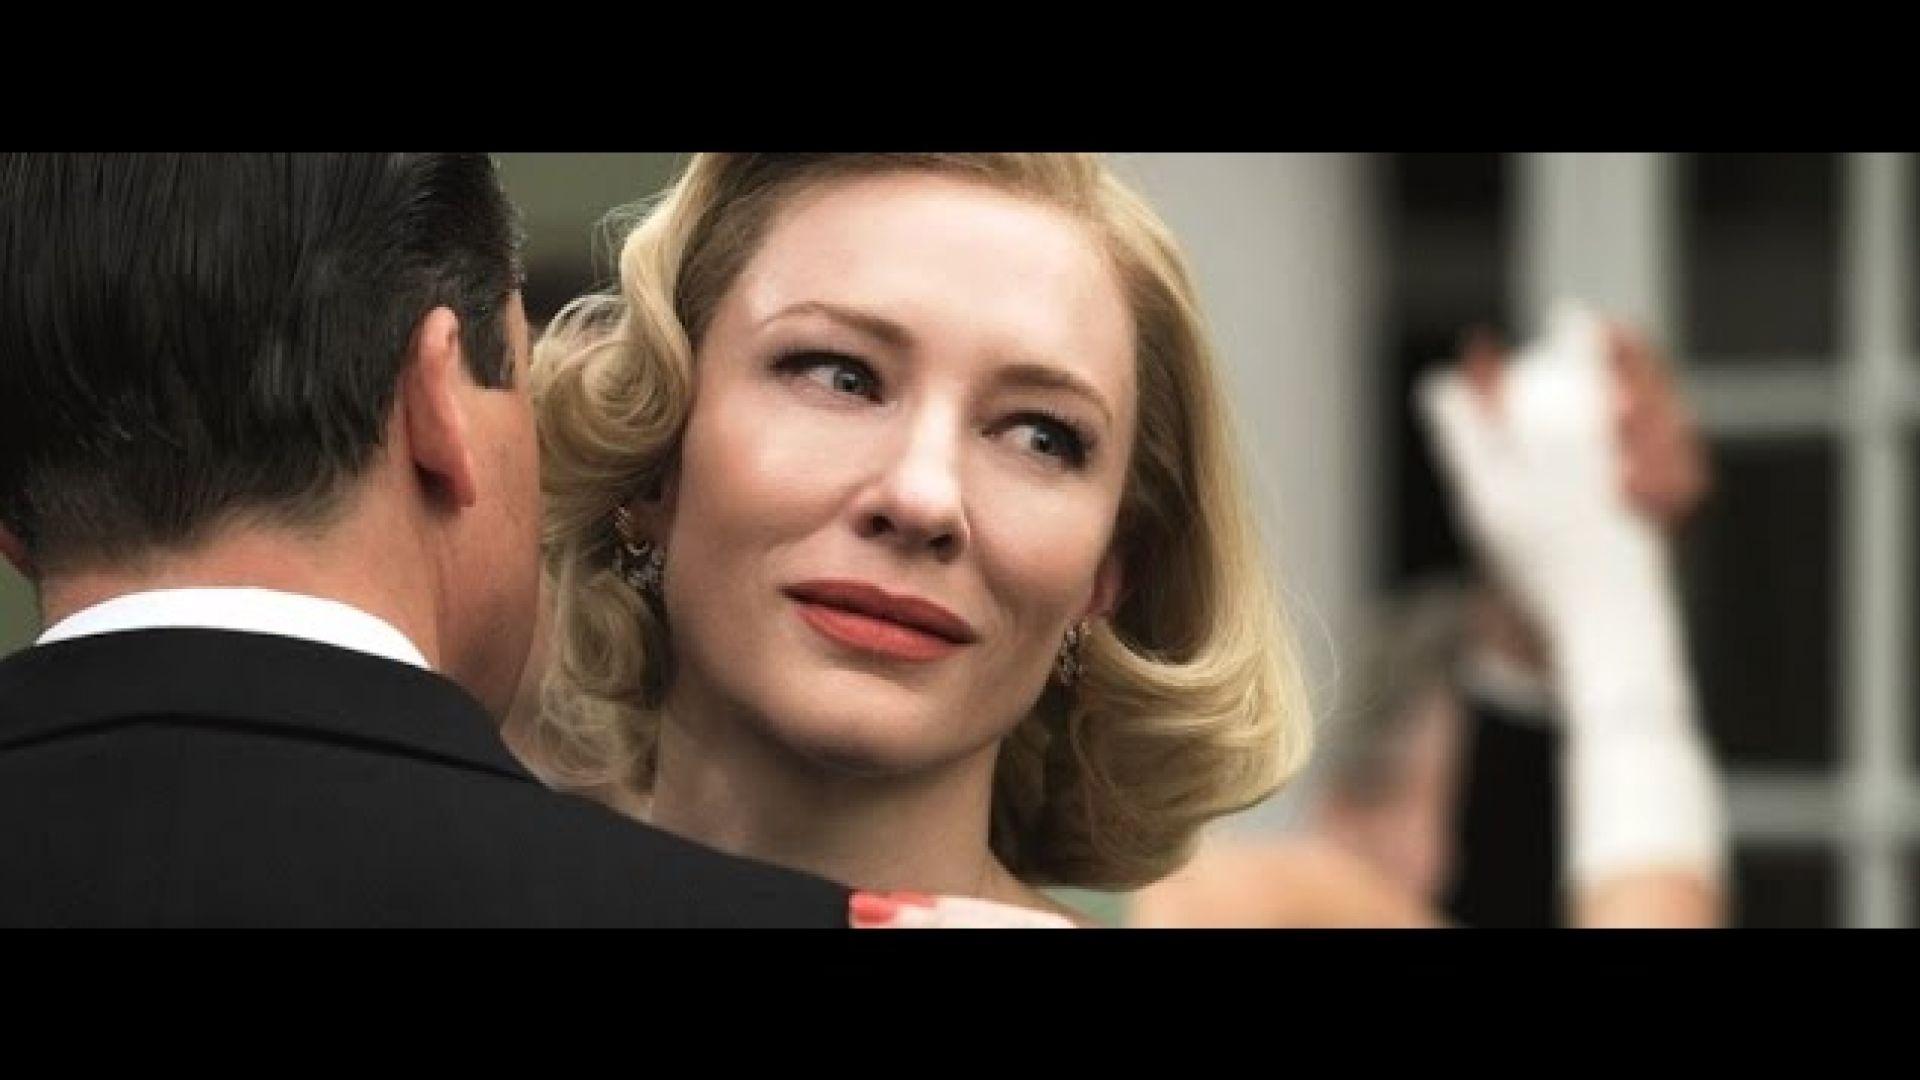 Teaser Trailer for Todd Haynes' Cannes Hit 'Carol' Starring